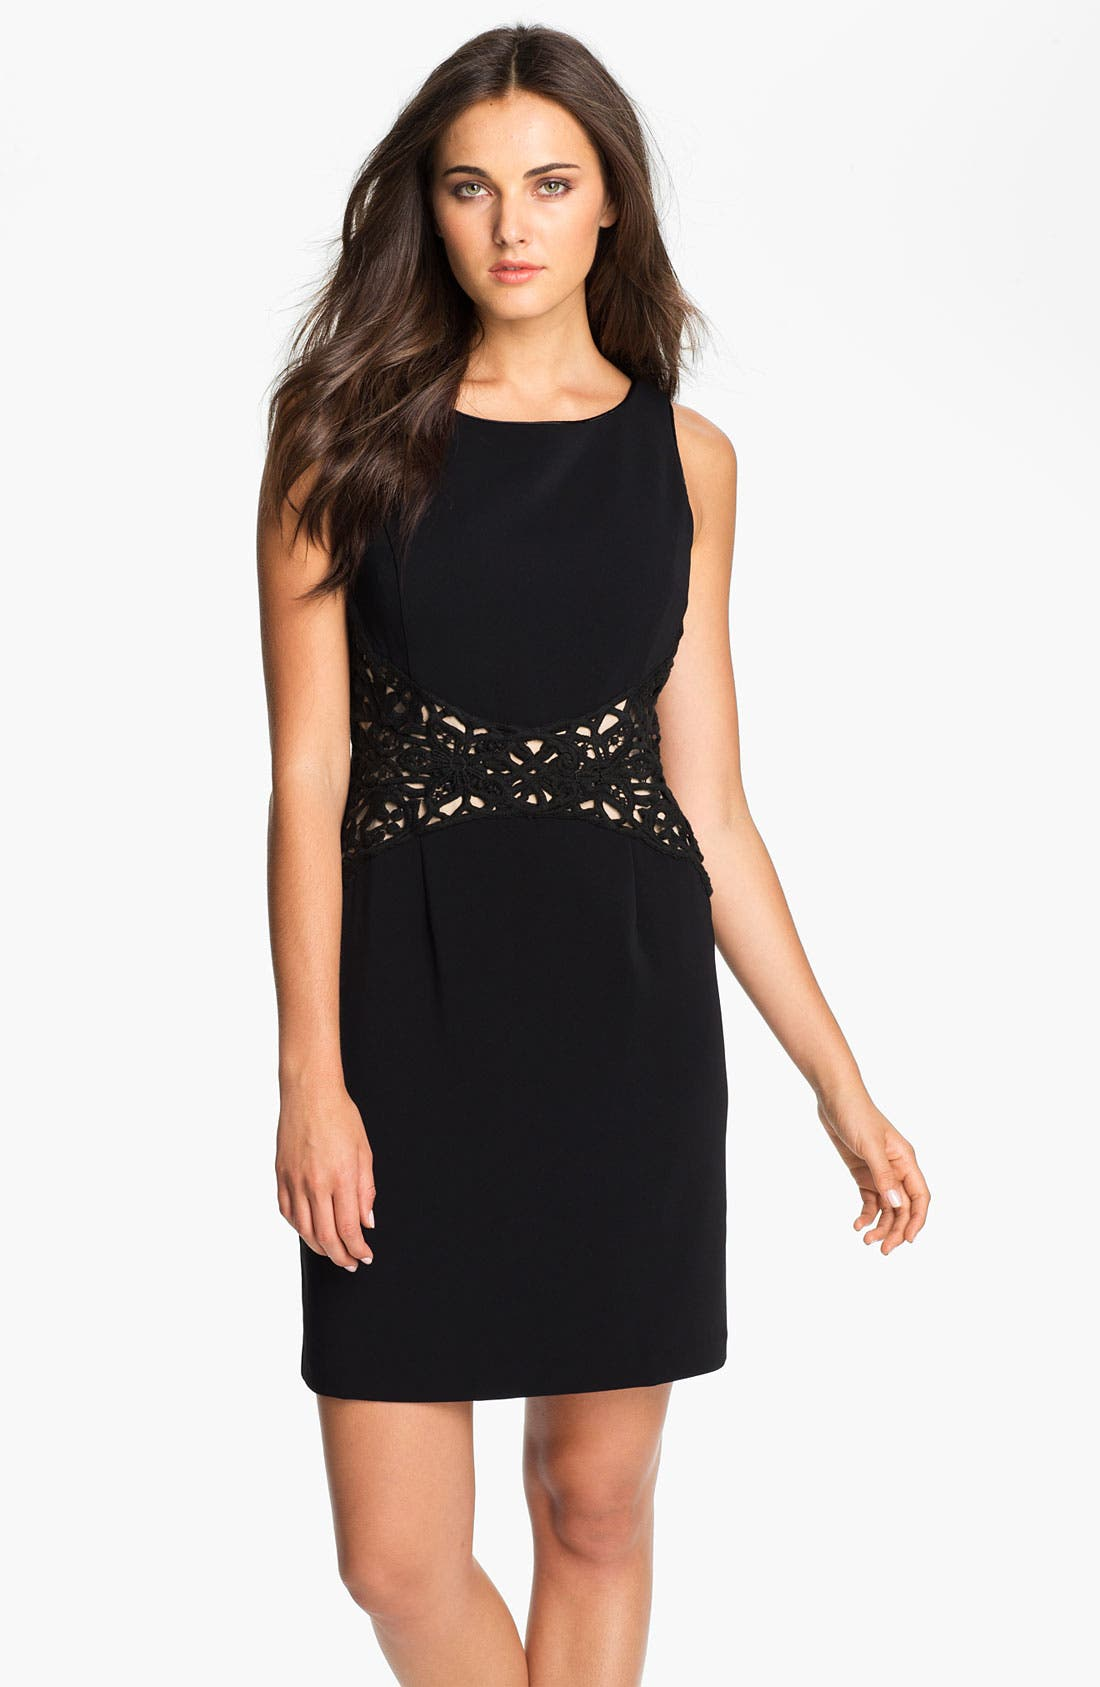 Alternate Image 1 Selected - Donna Ricco Sleeveless Sheath Dress (Petite)